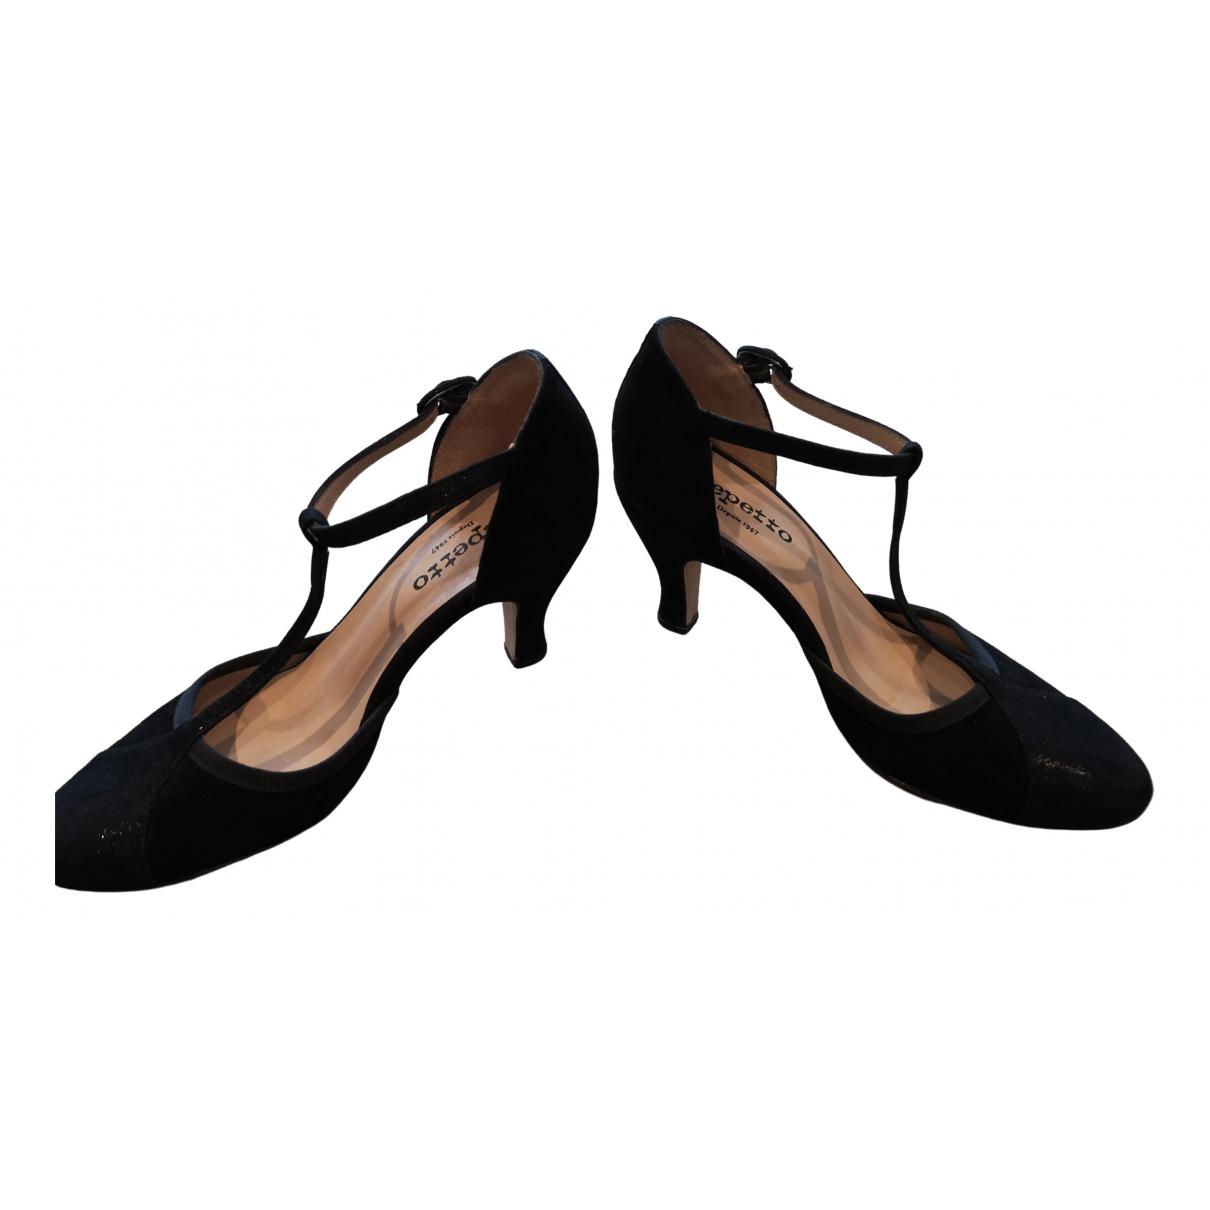 Repetto \N Black Suede Heels for Women 37.5 EU